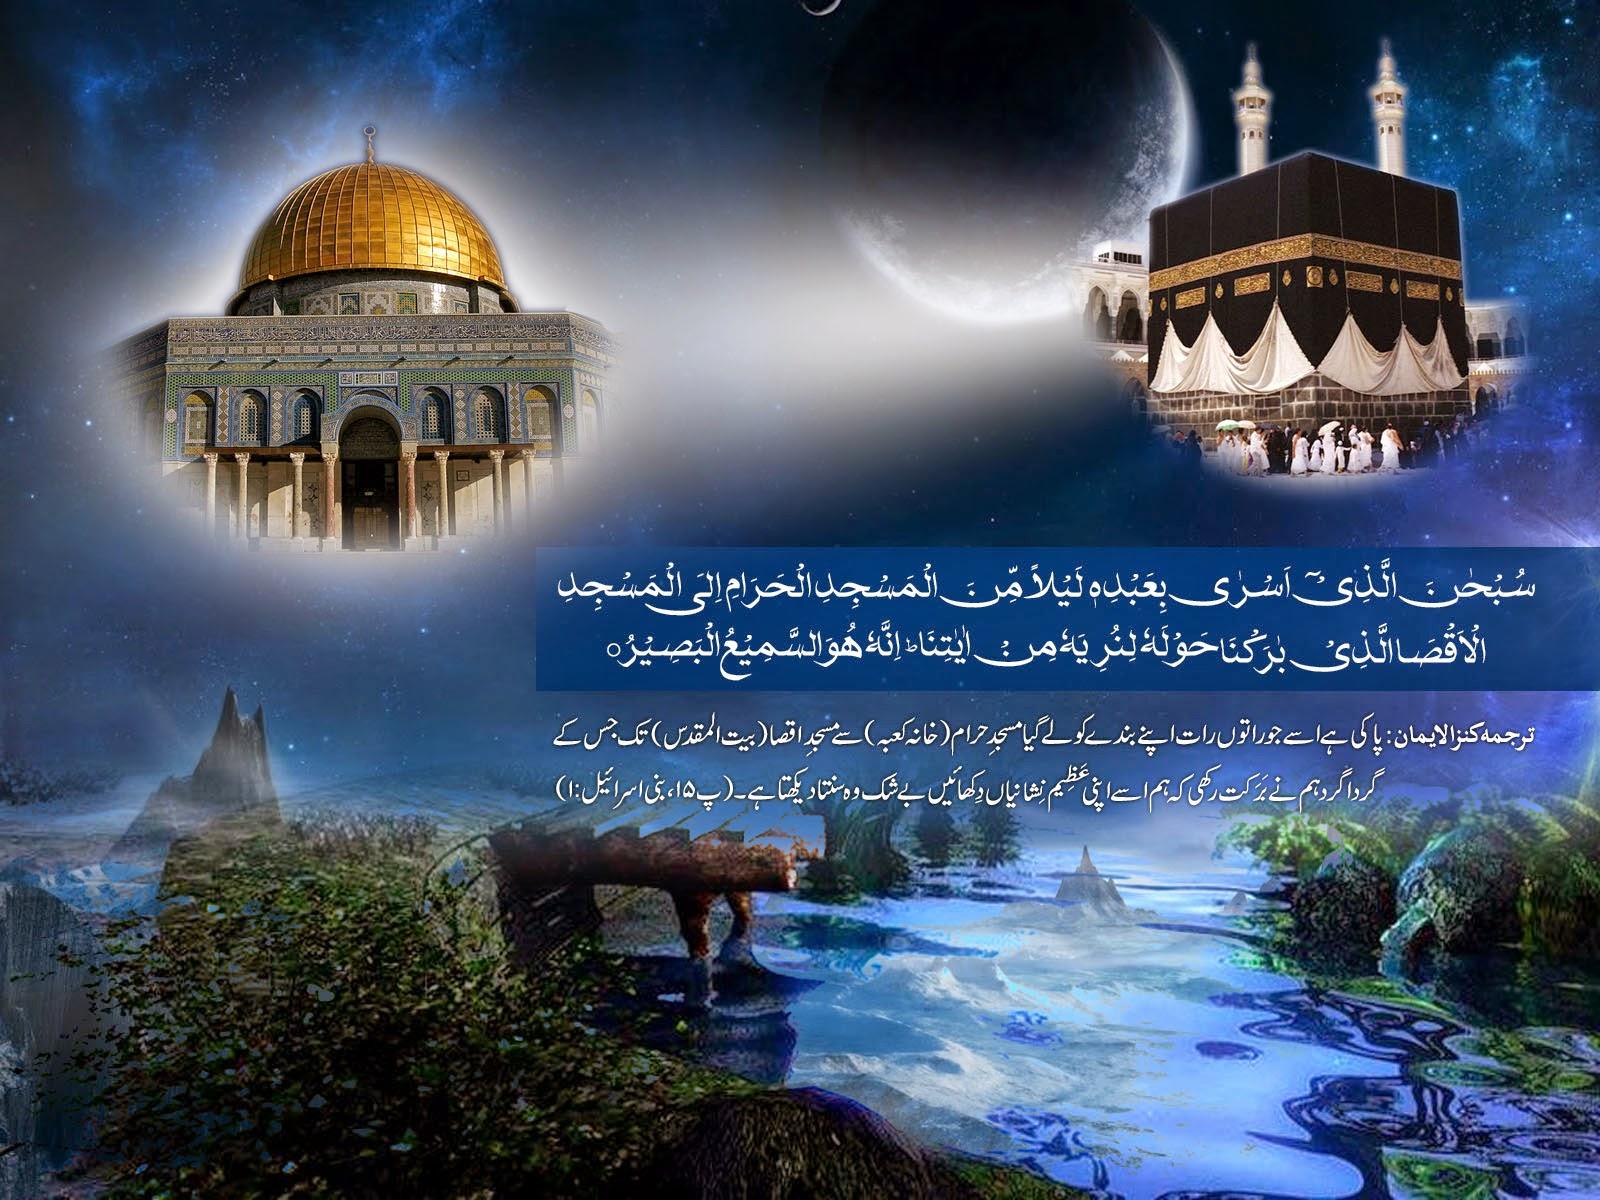 islamichaneel.blogspot.com